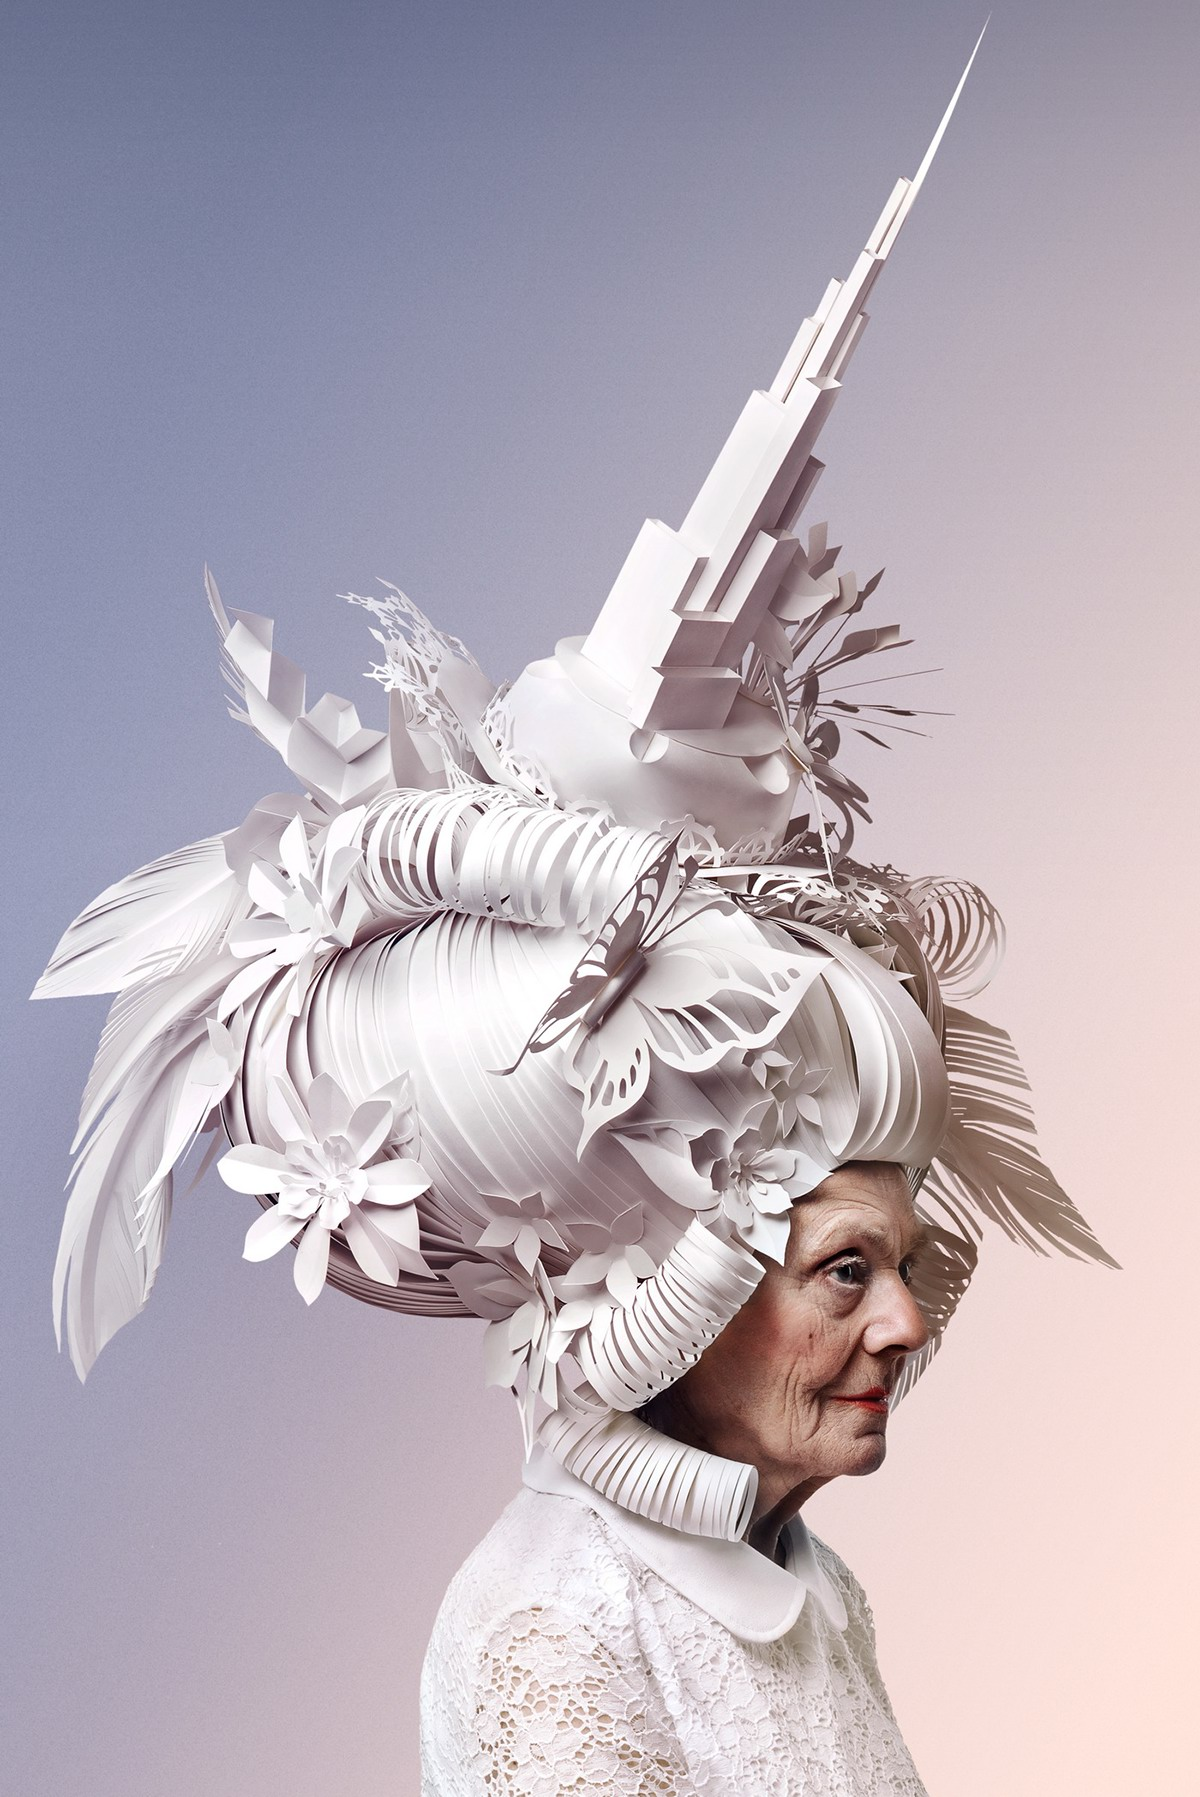 paper skyscraper luxury baroque paper art paper sculptures wig airplane costume ship